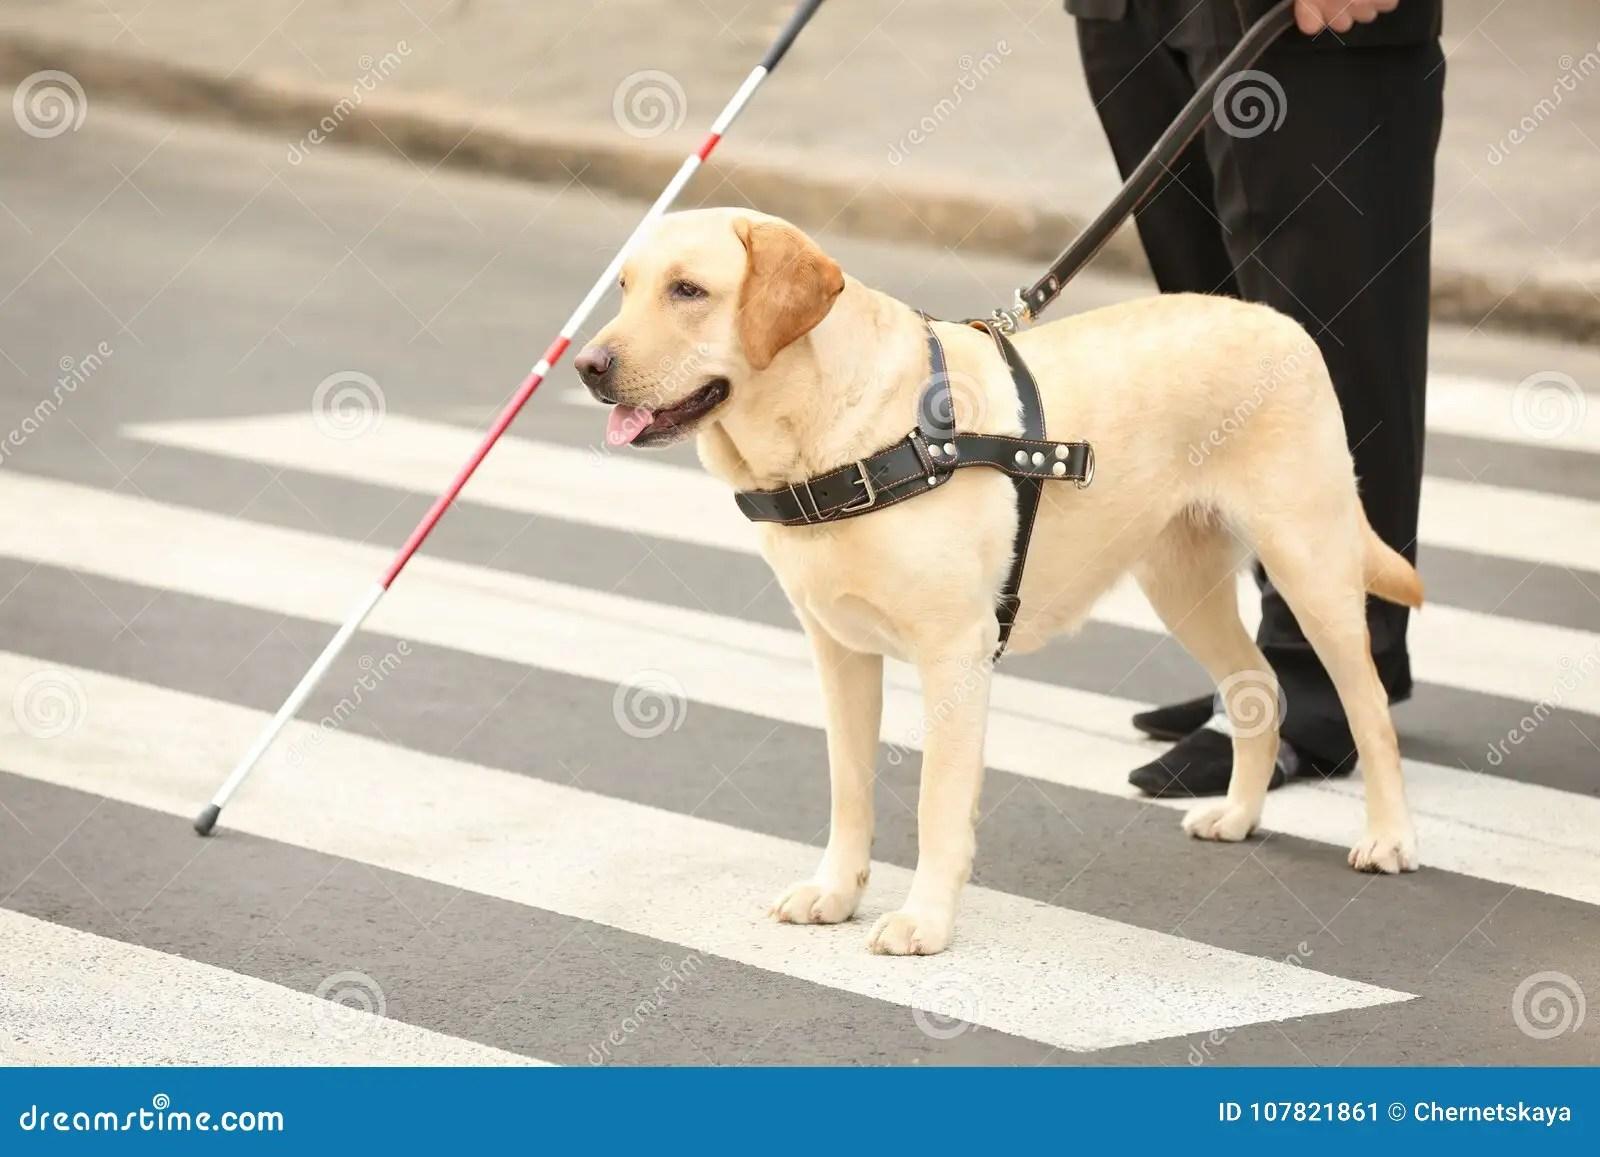 Guide Dog Helping Blind Man Stock Image